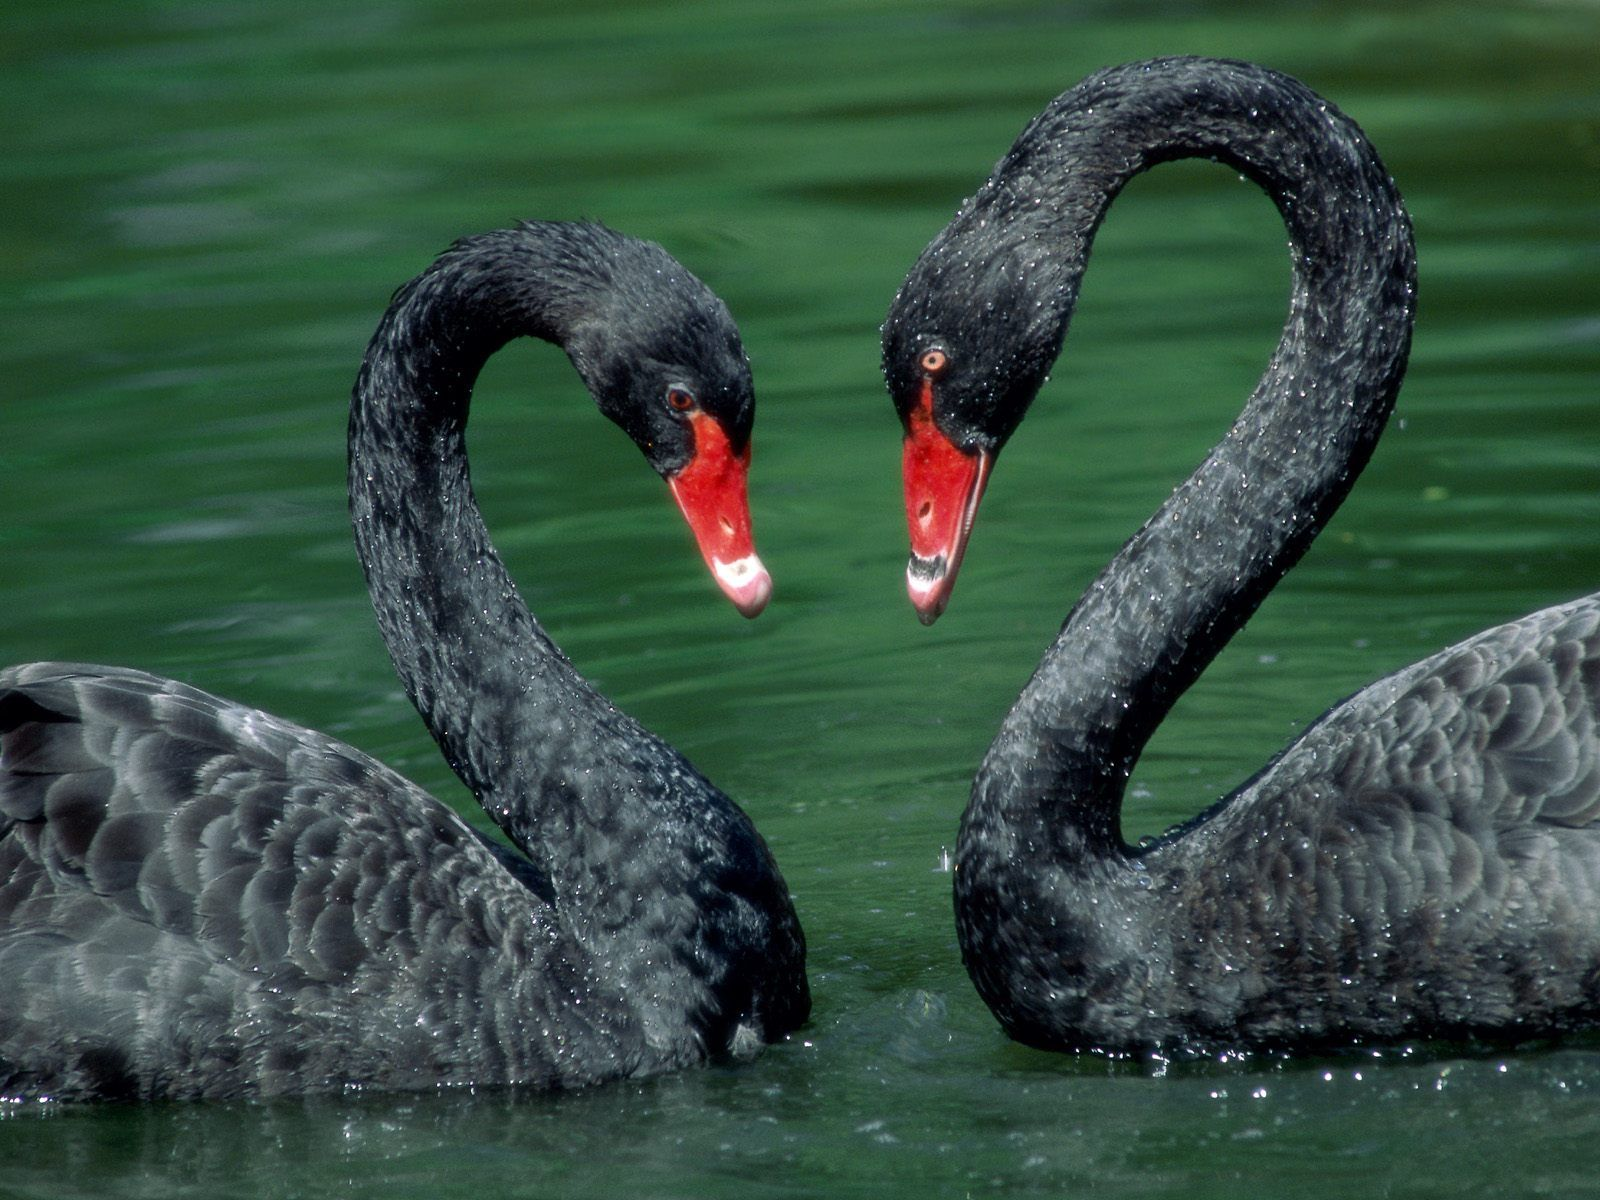 Fotos de Reptiles Animales Web Quest Webnode - imagenes de animales aves